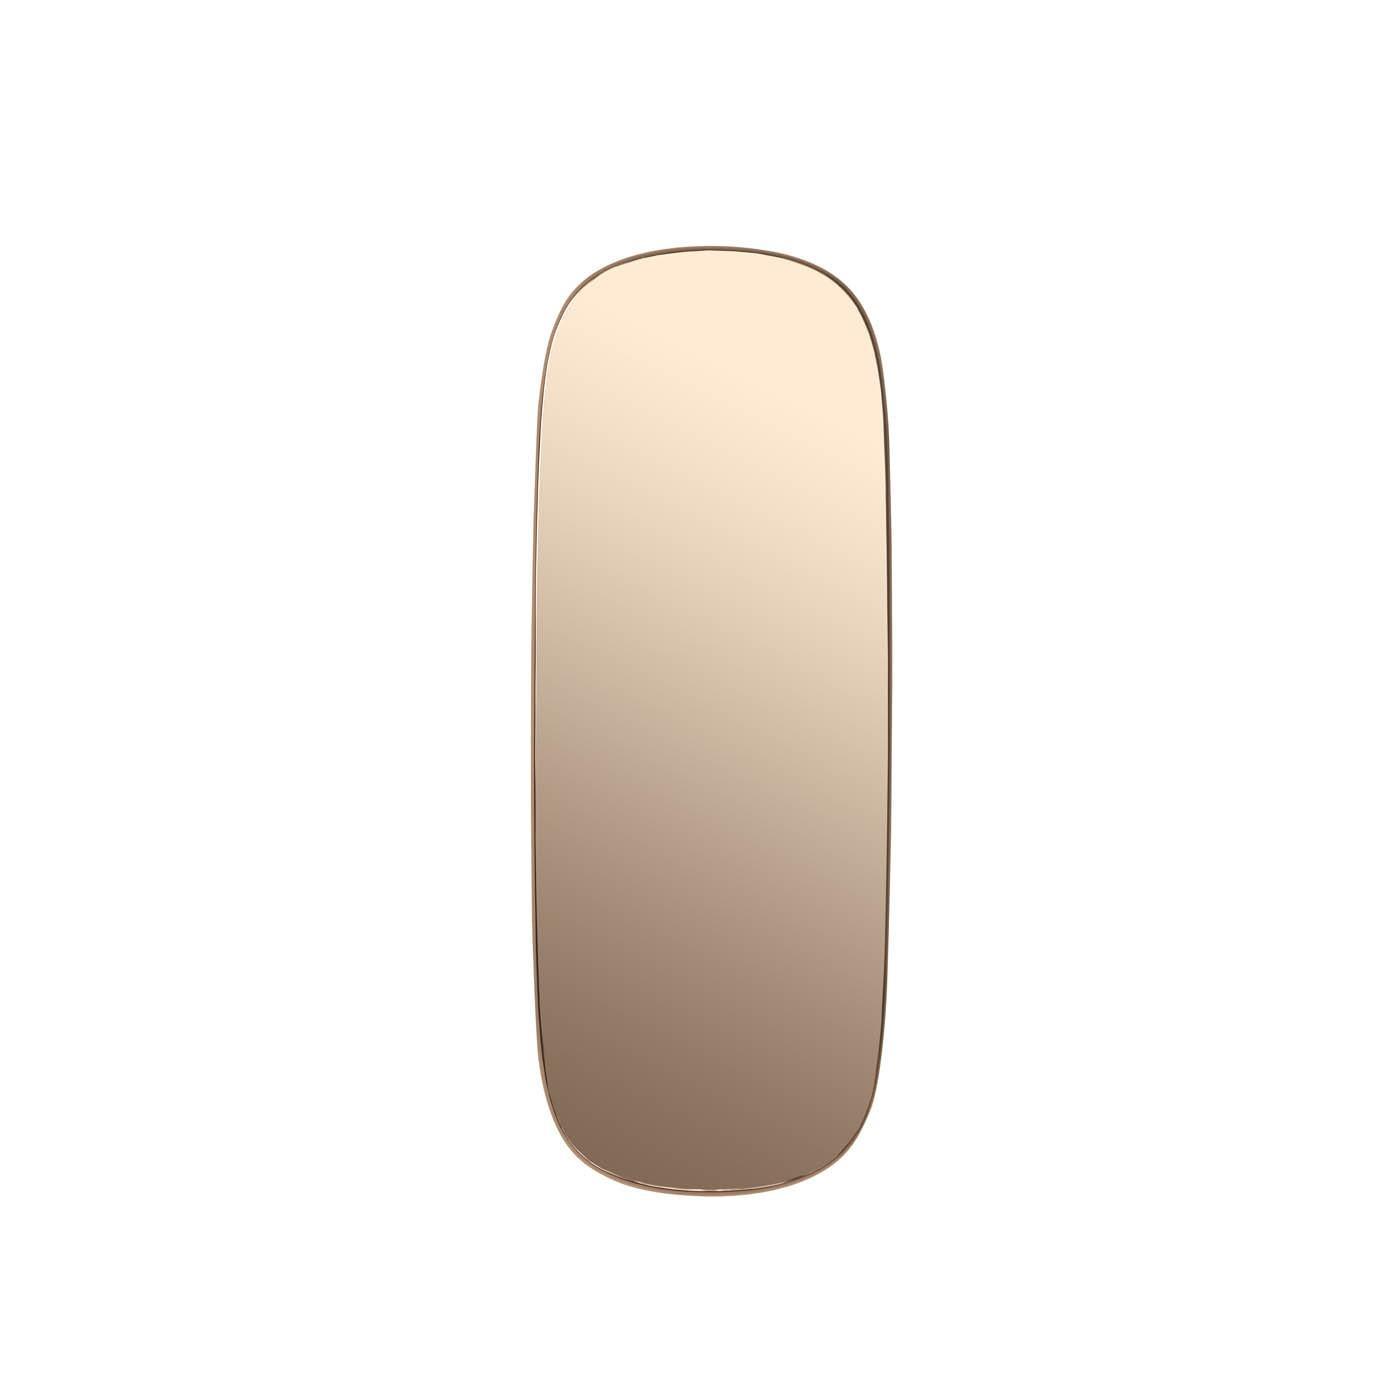 Muuto Framed Mirror - Large